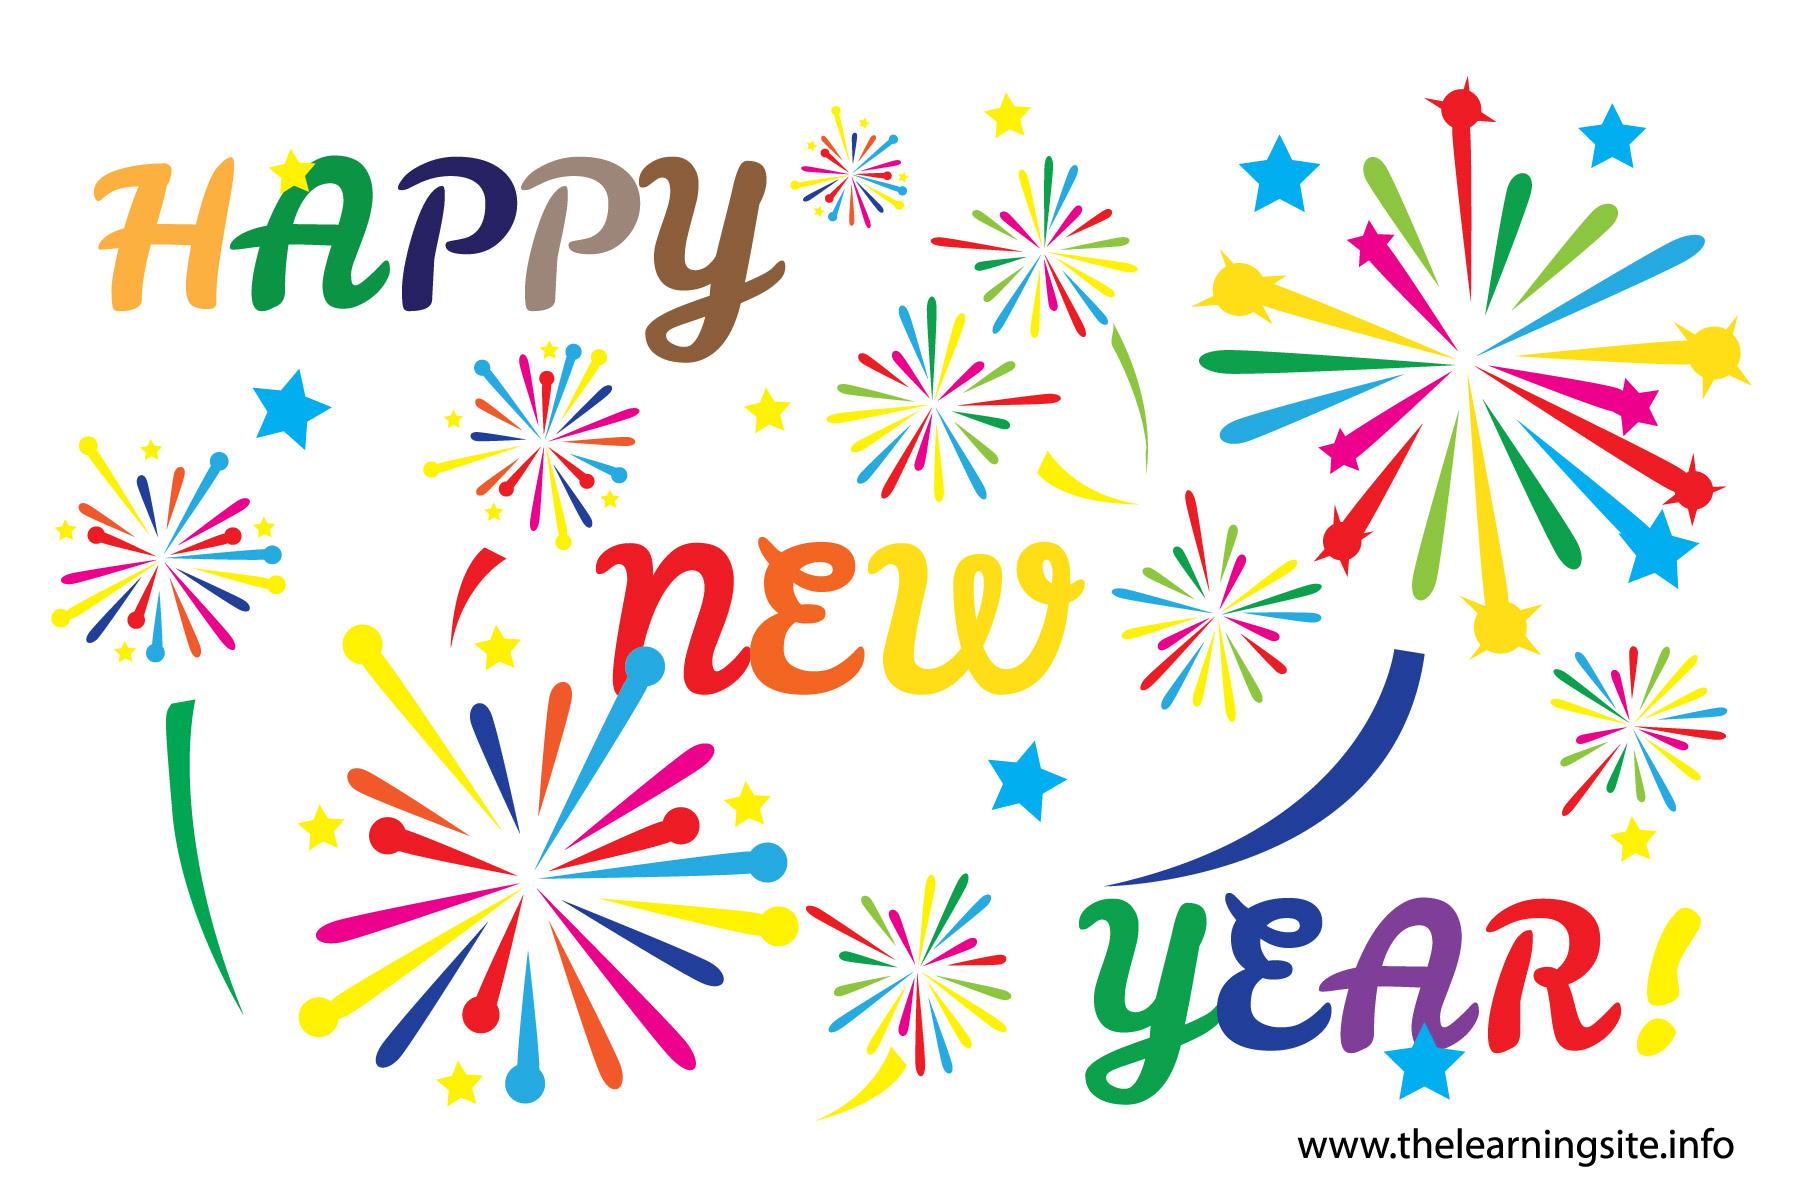 Happy New Year 2017 clipart. New Year-Happy New Year 2017 clipart. New Year-9